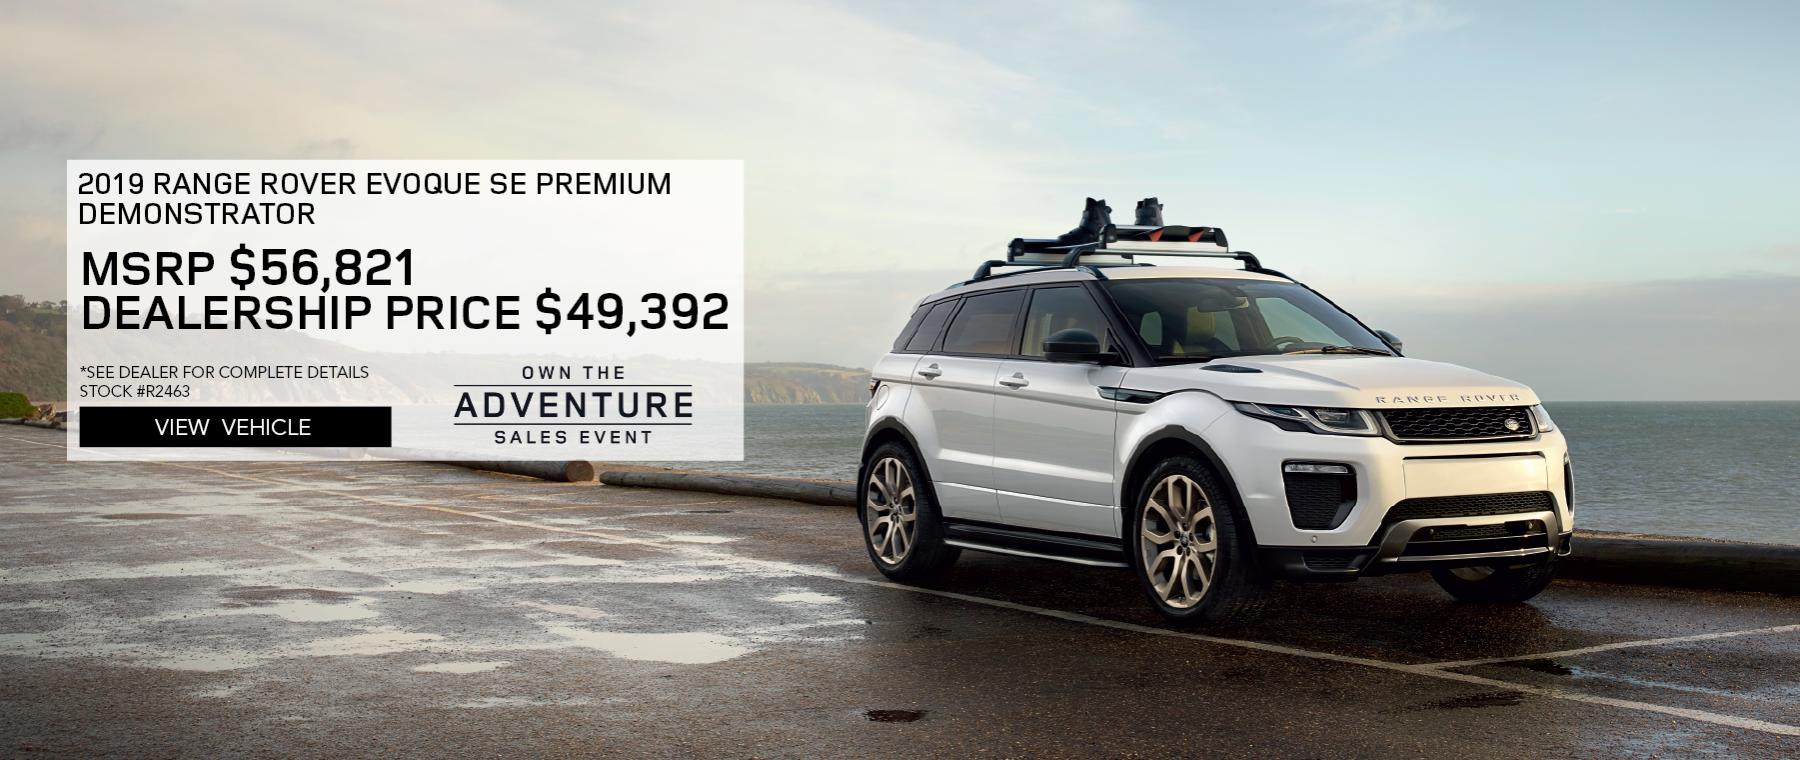 White 2019 Range Rover Evoque SE Premium with Navigation on foggy road. MSRP $56,821 Dealership Price $49,392 Stock #R2463. See dealer for complete details. Offer Expires 2/29/2020